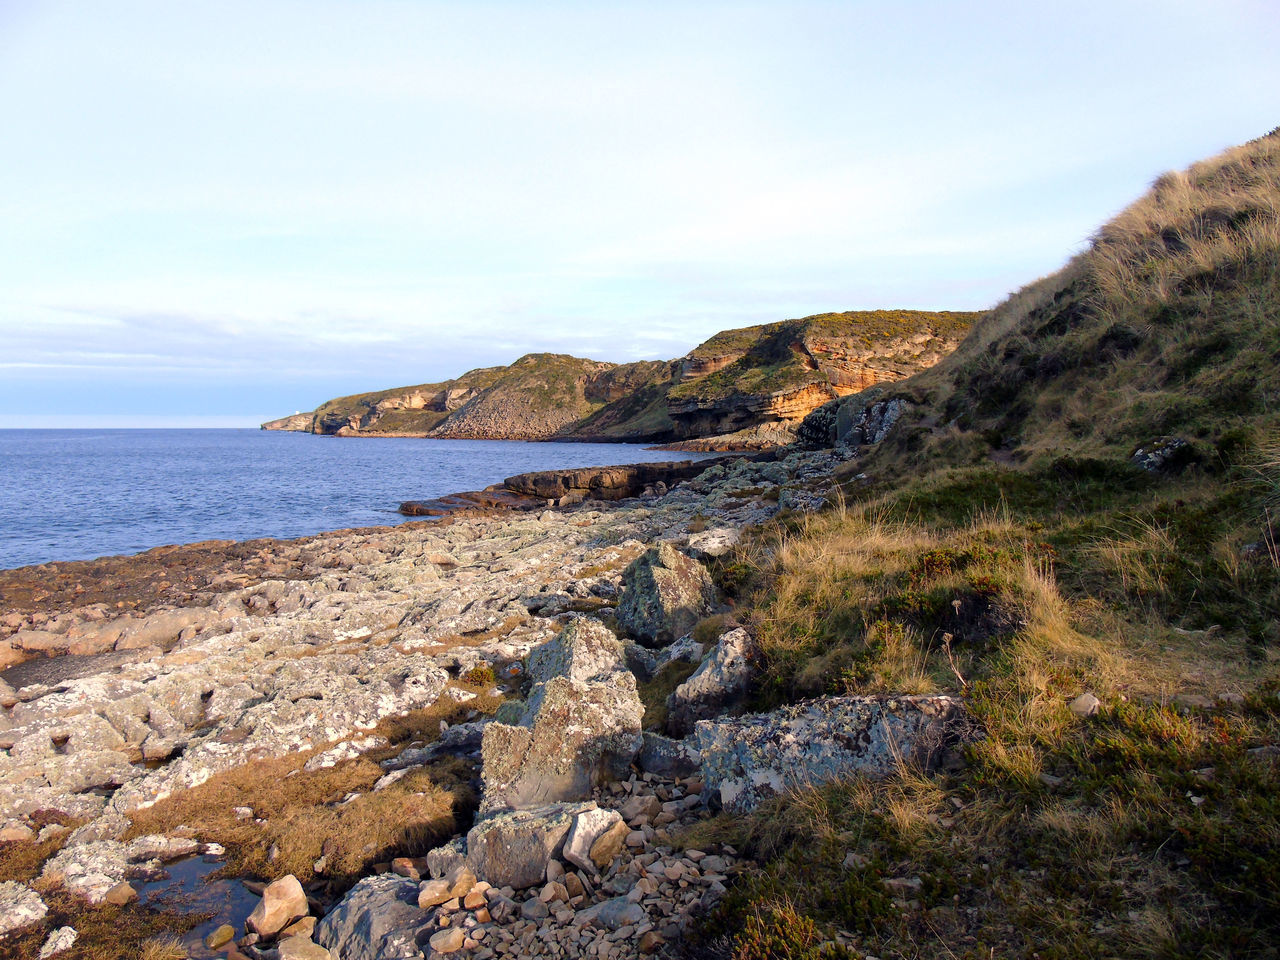 Beautiful stock photos of scotland, Hopeman, United Kingdom, beauty in nature, blue